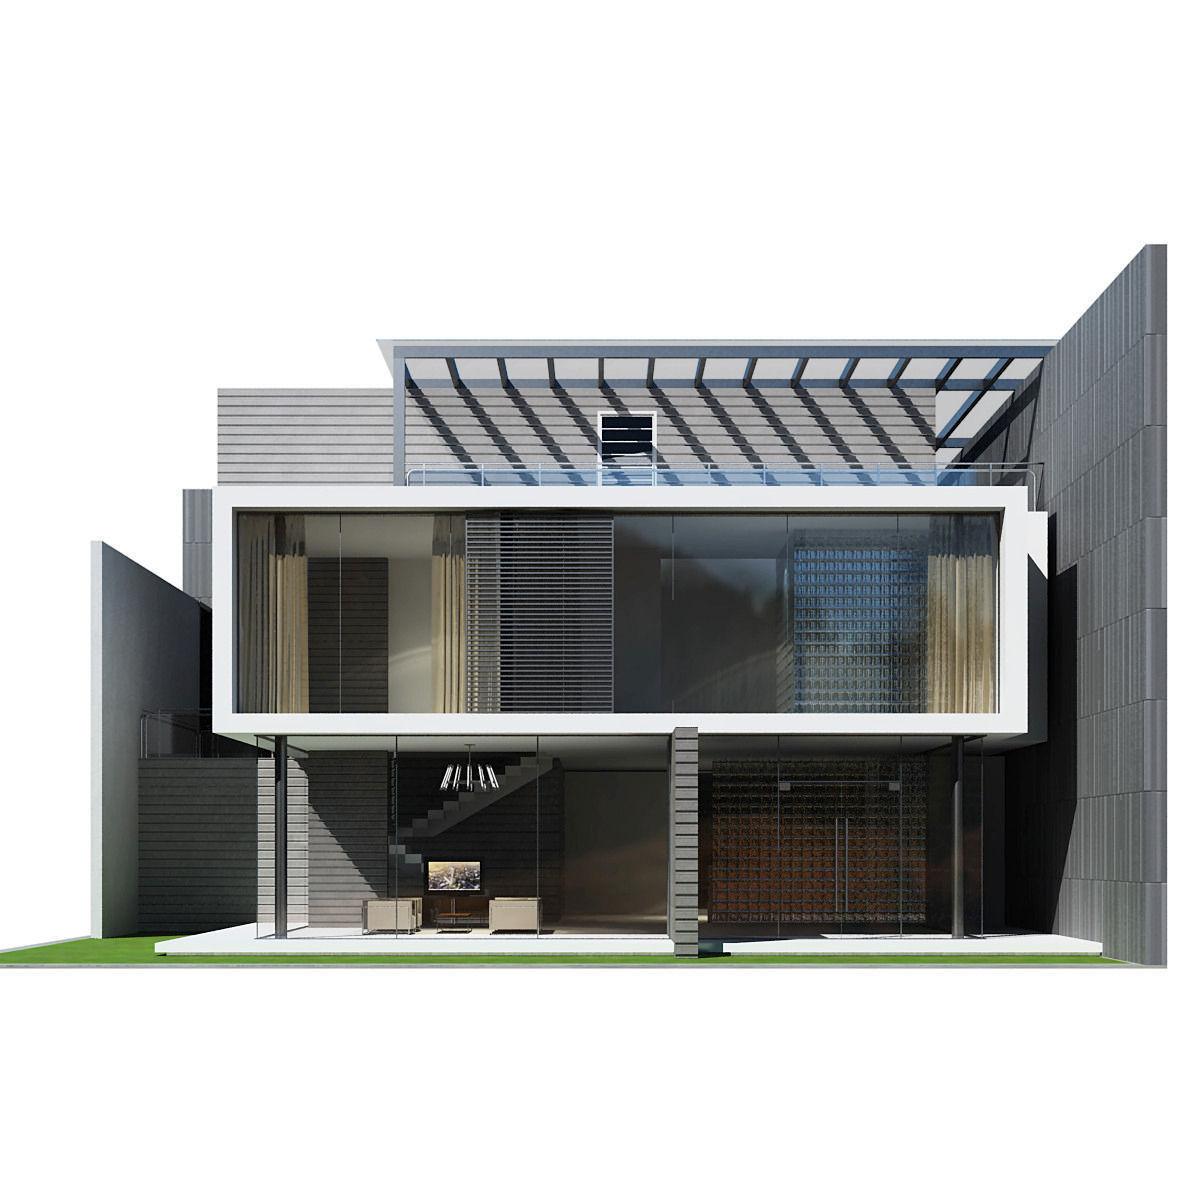 Modern house 3d model max obj 3ds fbx - 3d max models free download exterior ...